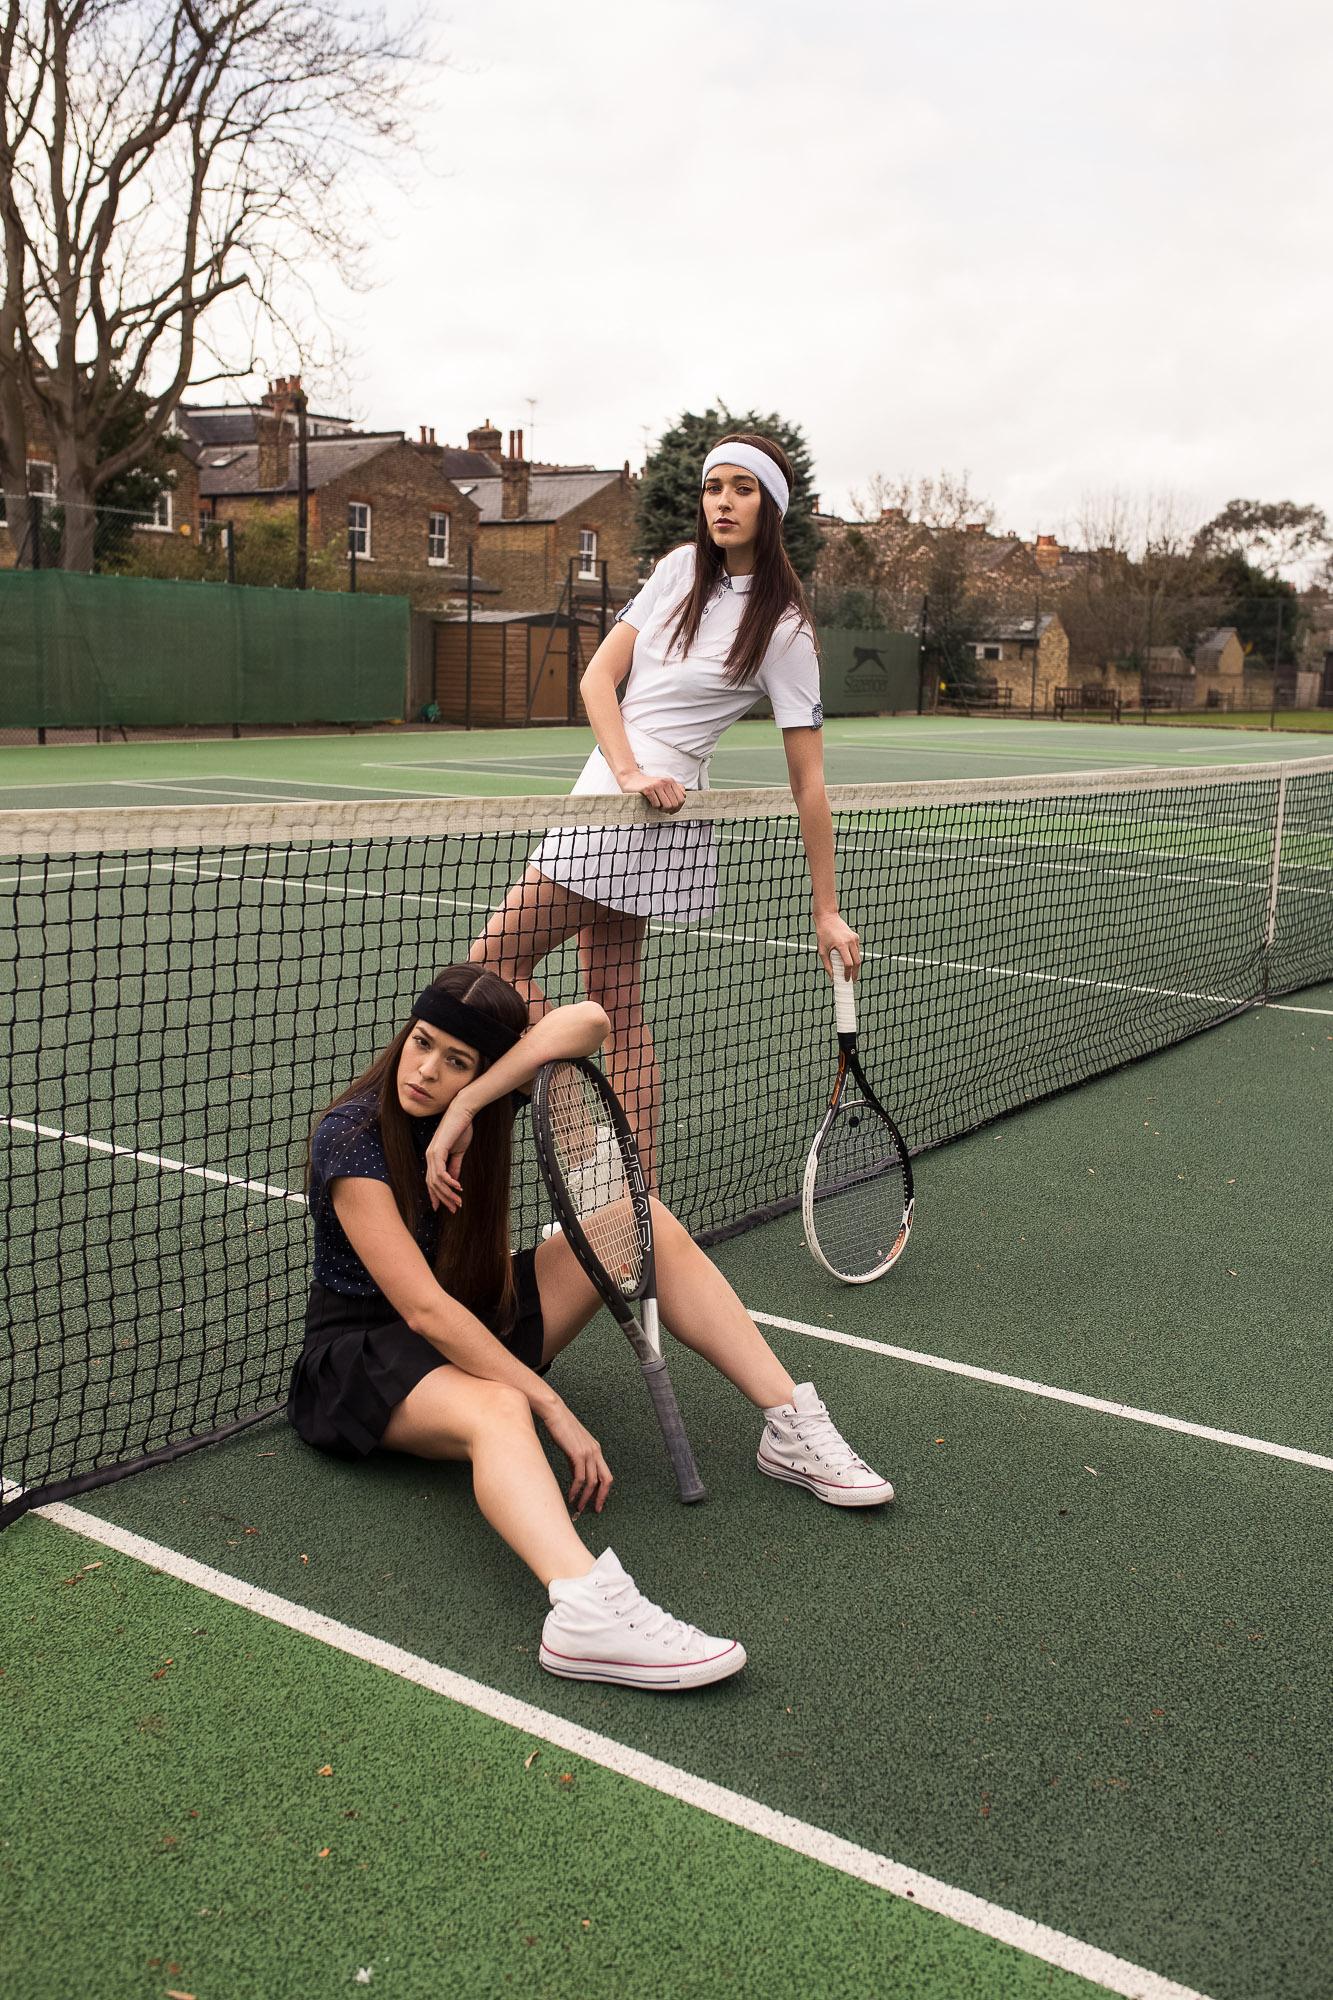 tennis fashion editorial london-3.jpg